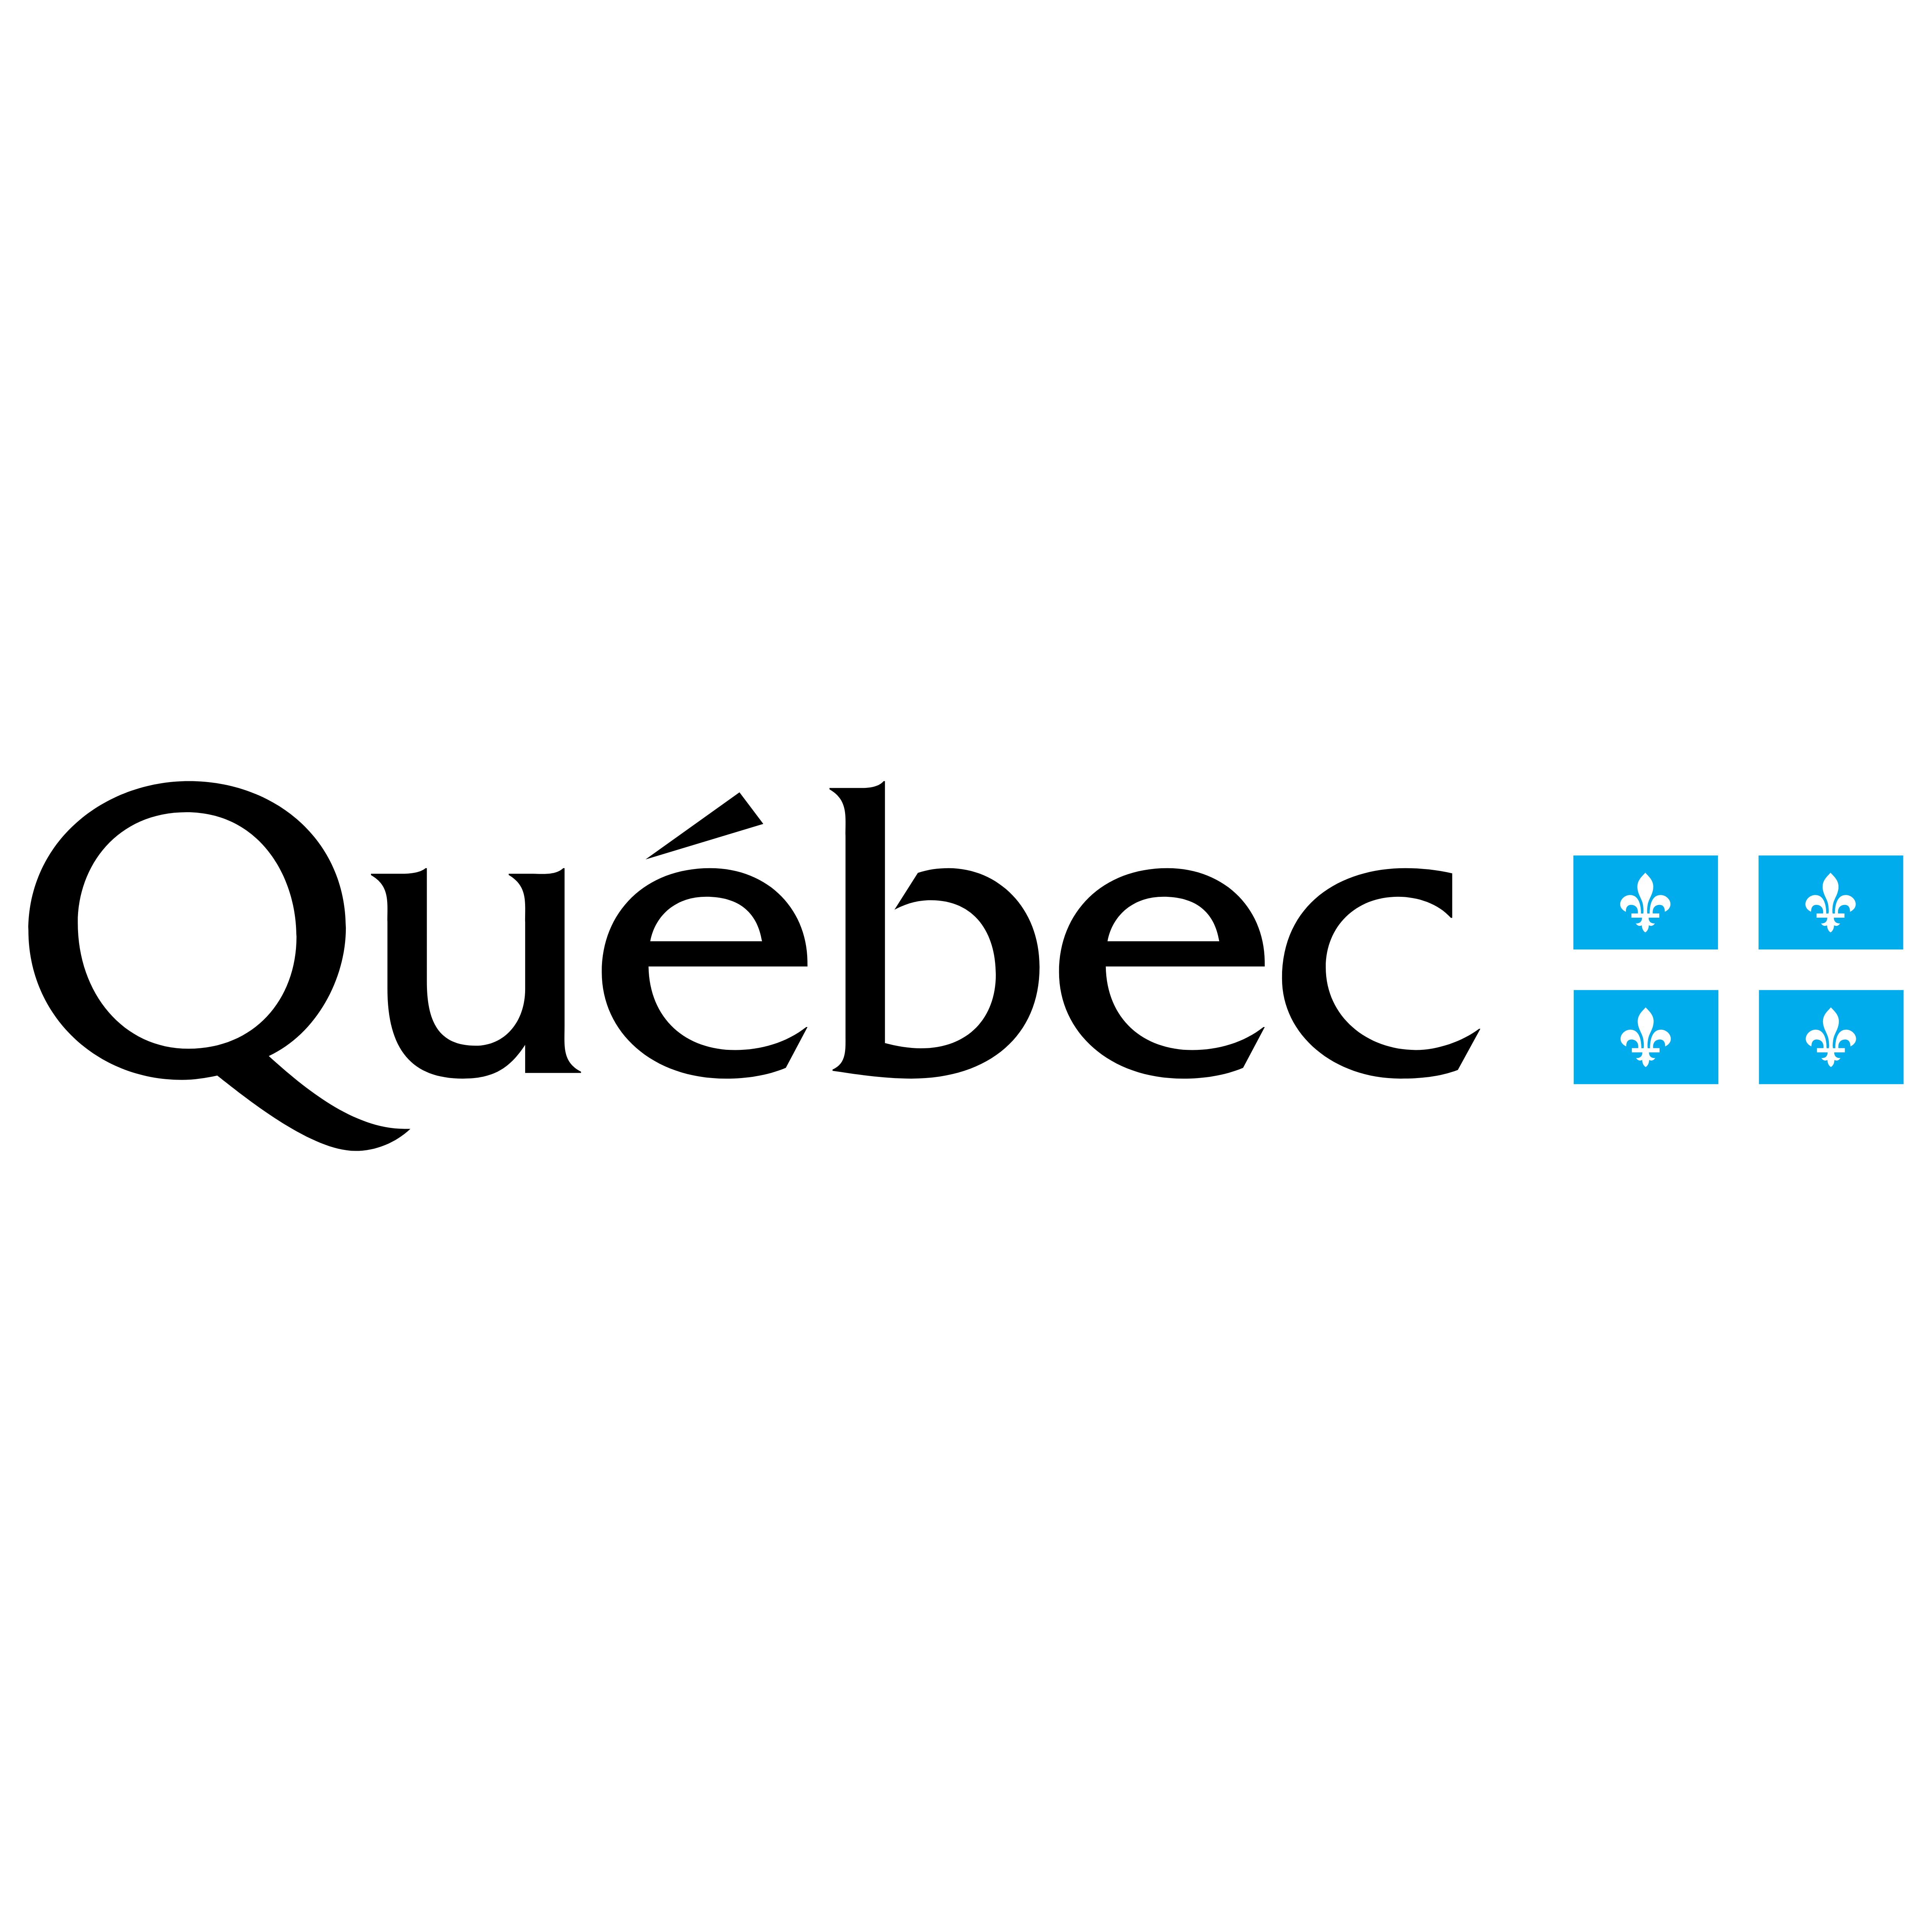 Quebec Logos Download